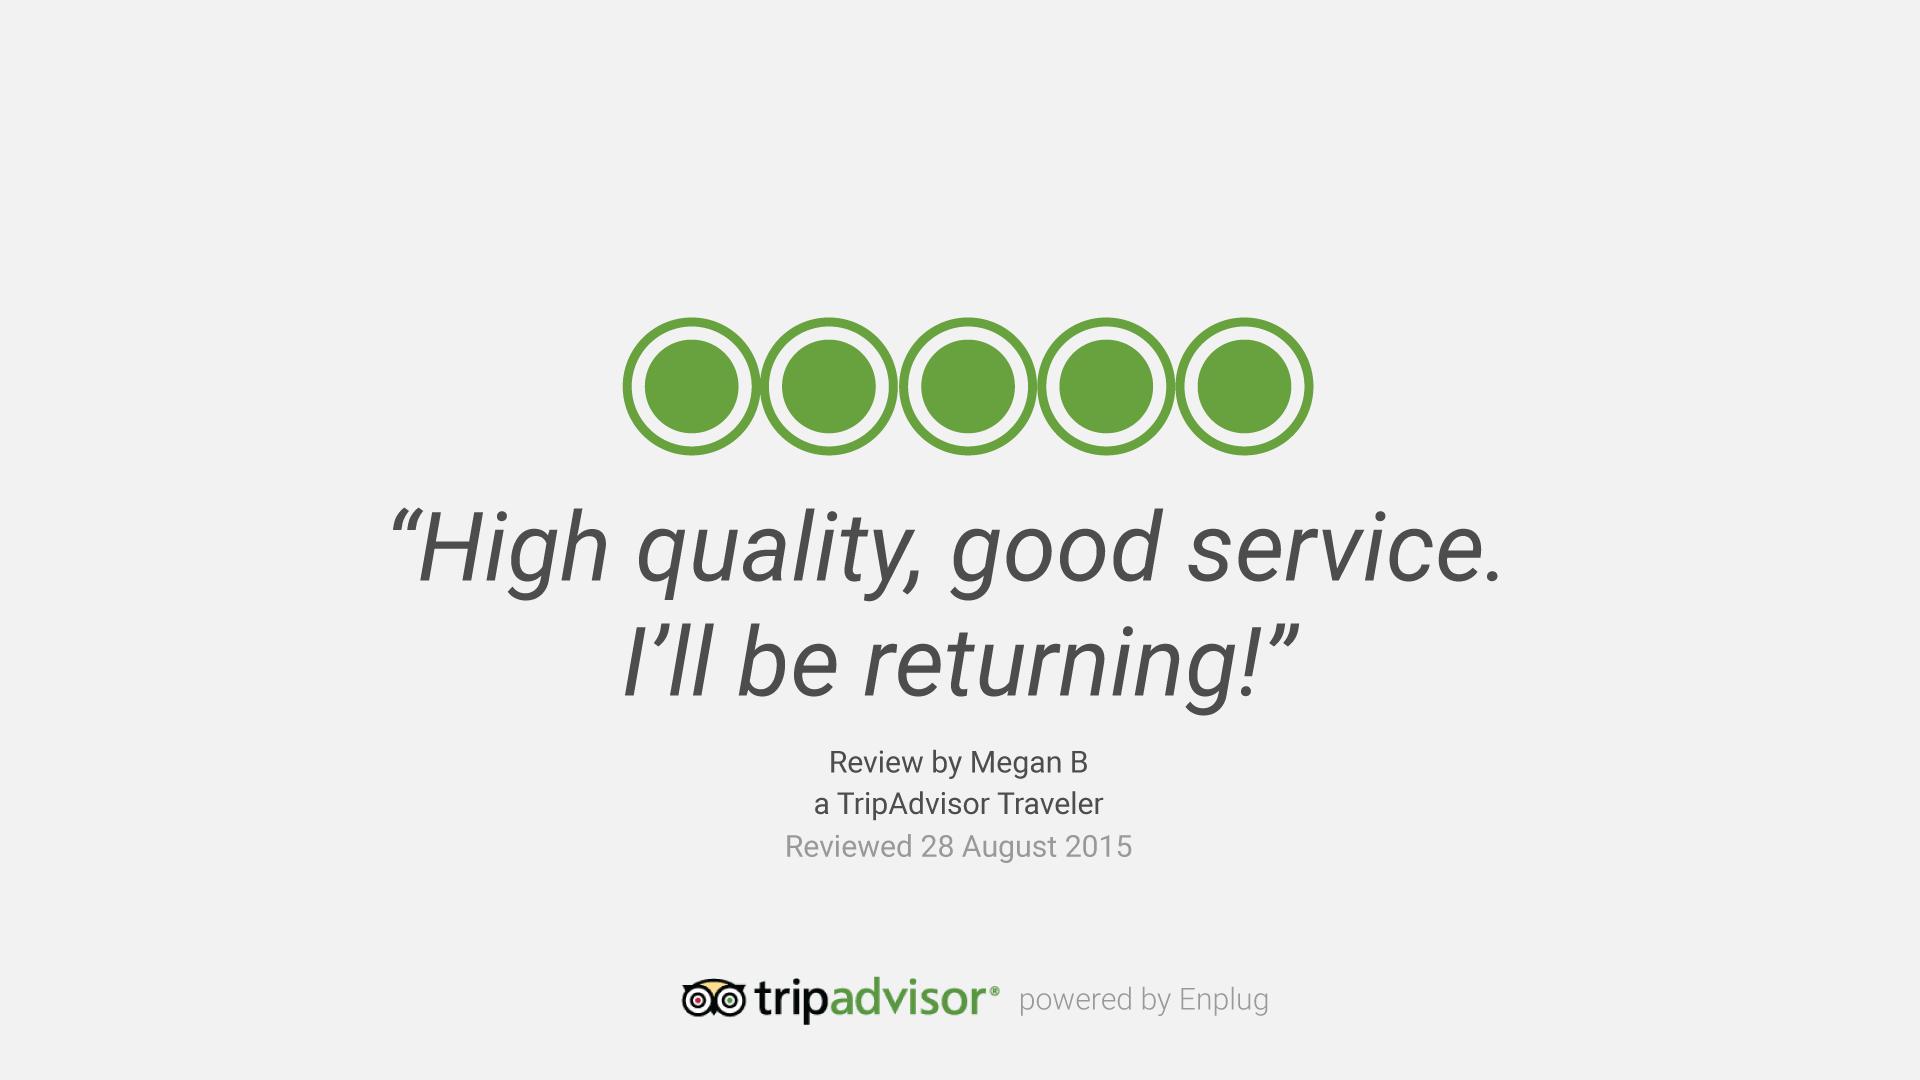 Enplug's new TripAdvisor integration enable hotels and restaurants to stream customer reviews on